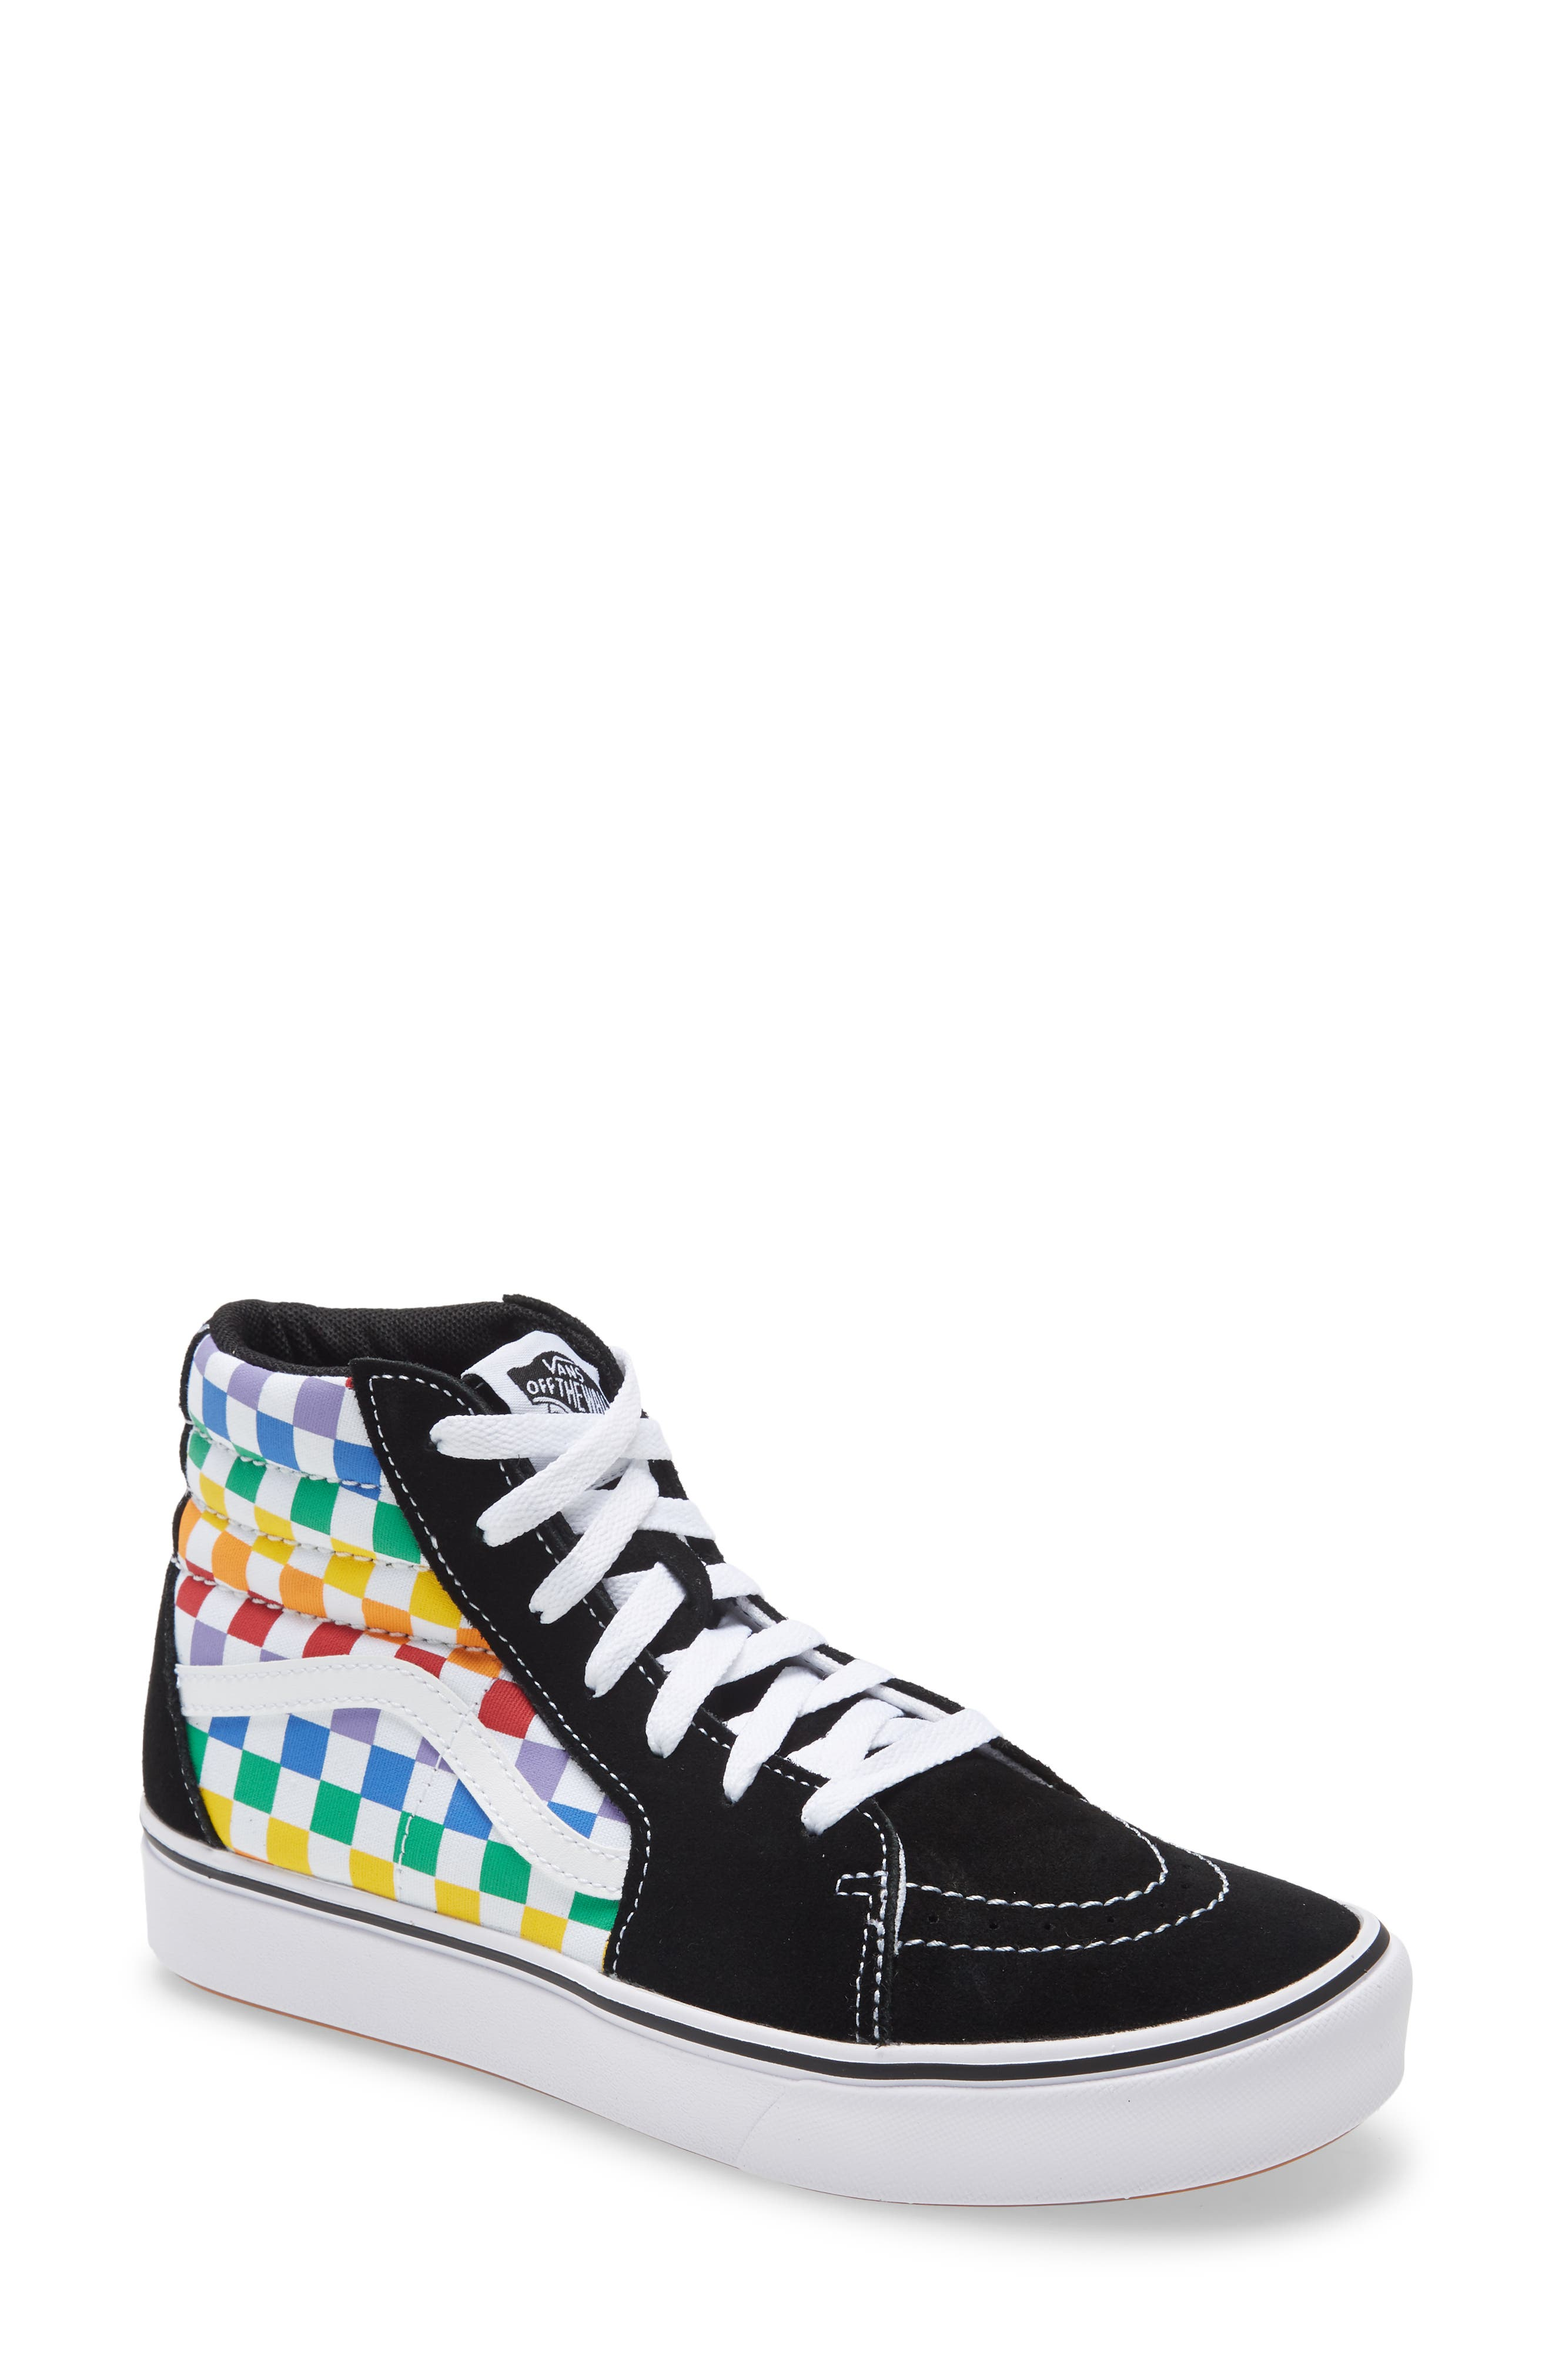 Big Girls' Vans Shoes (Sizes 3.5-7)